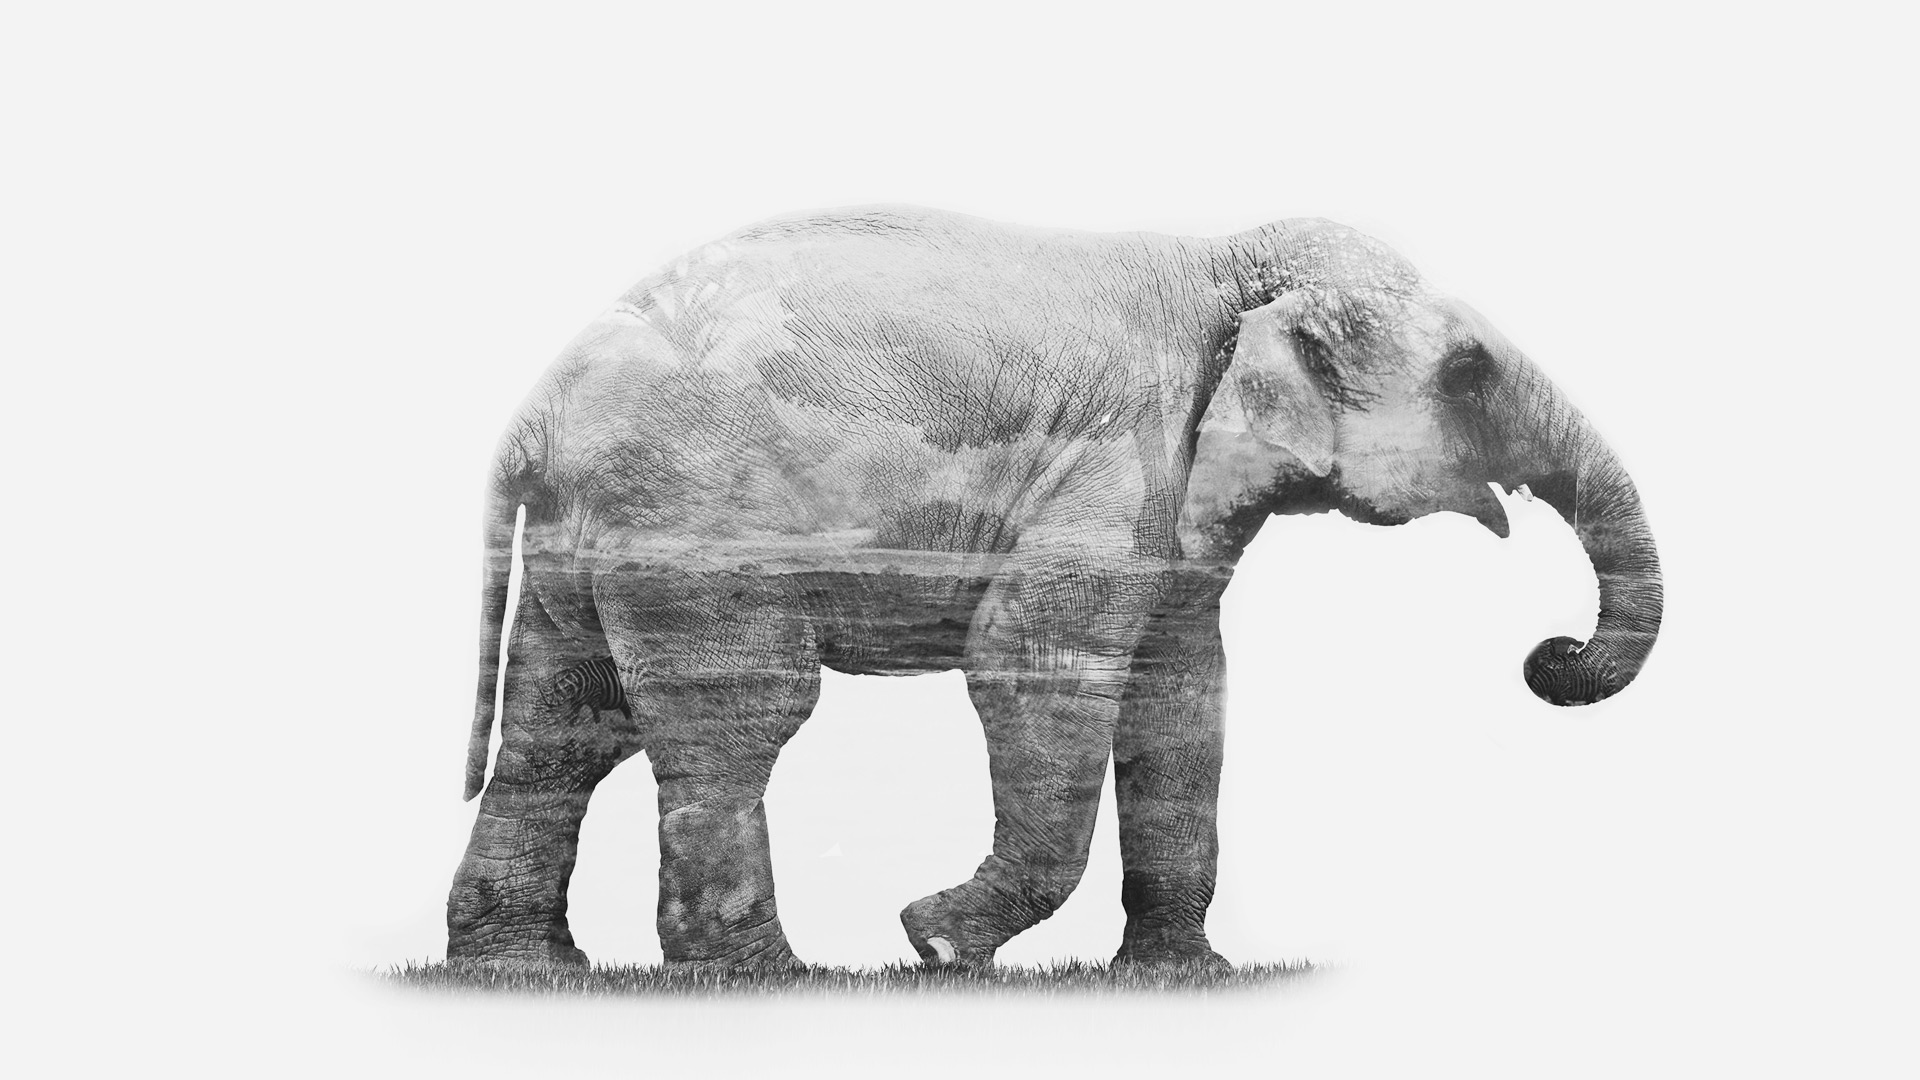 Animals & Environments elephant